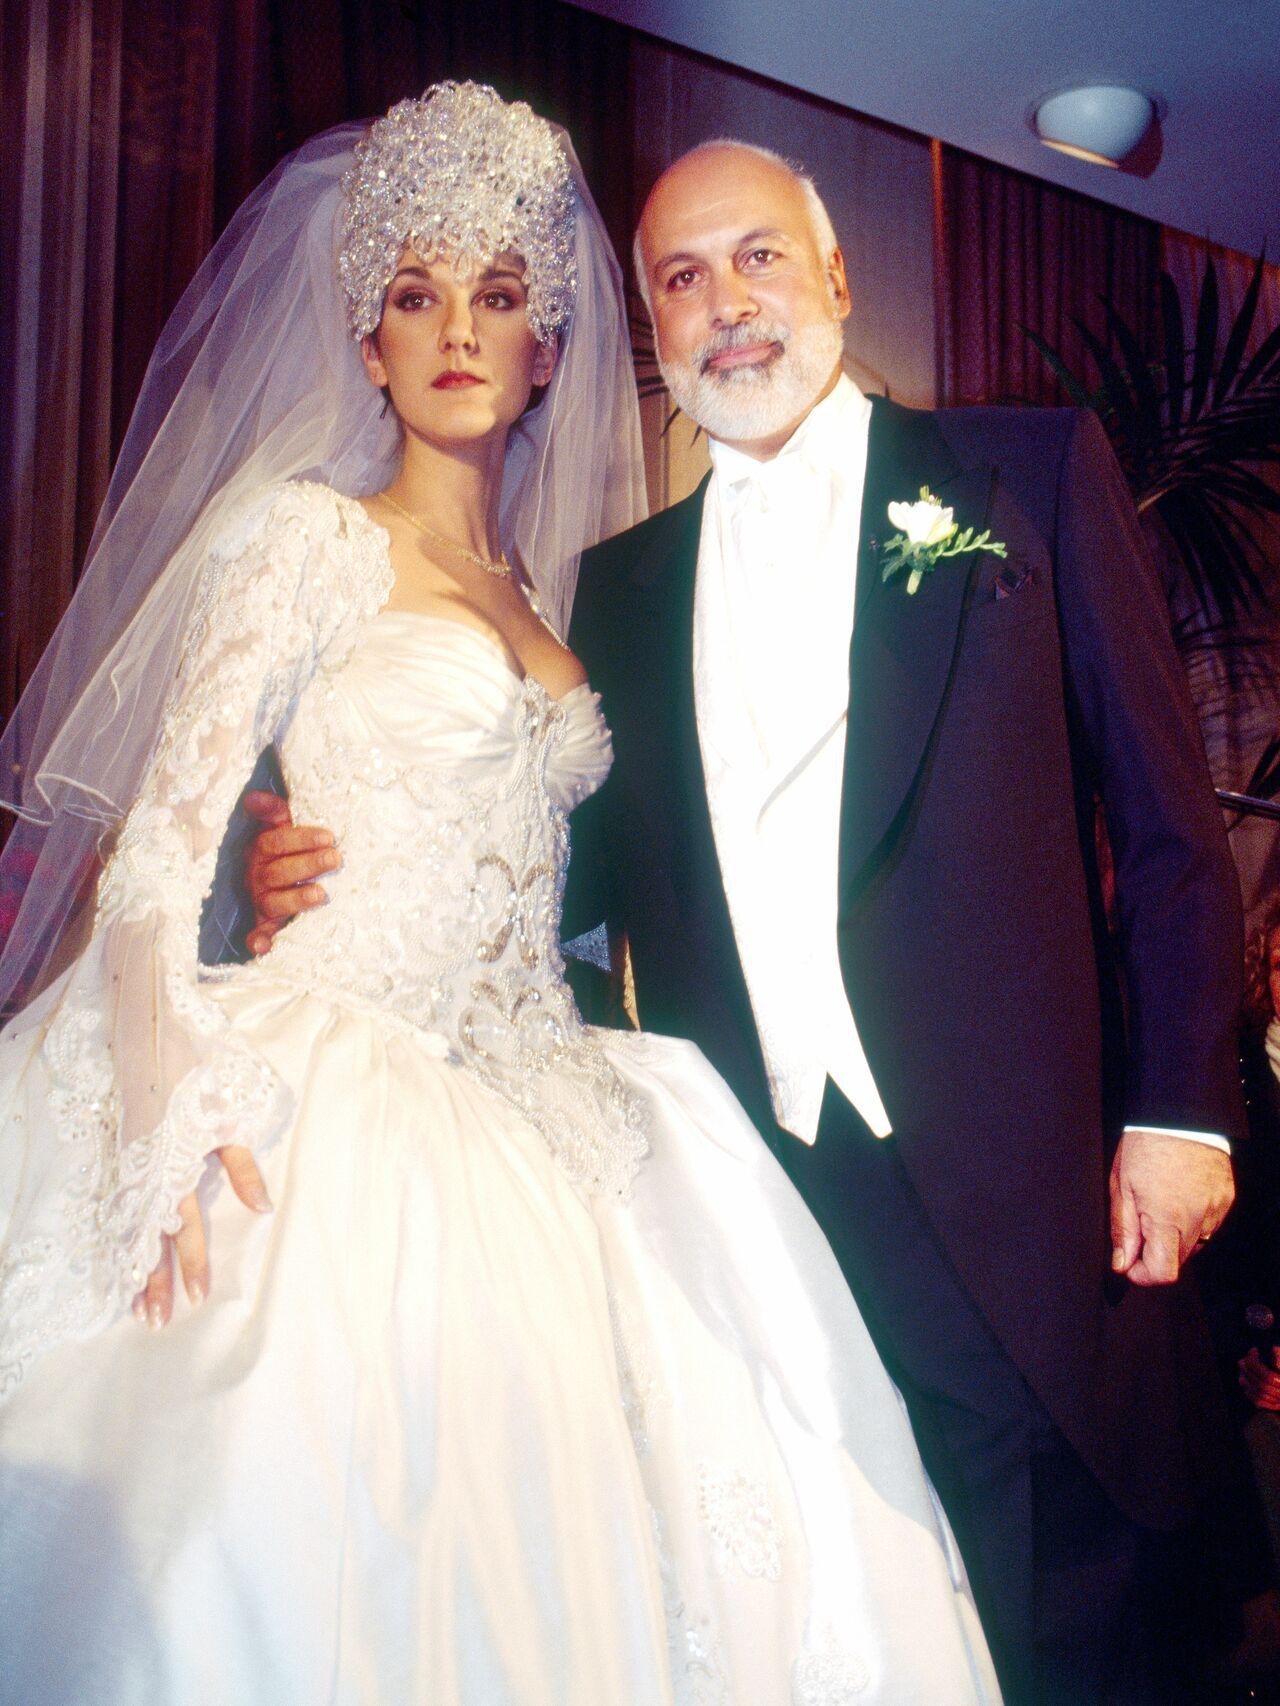 Celine Dion's wedding dress